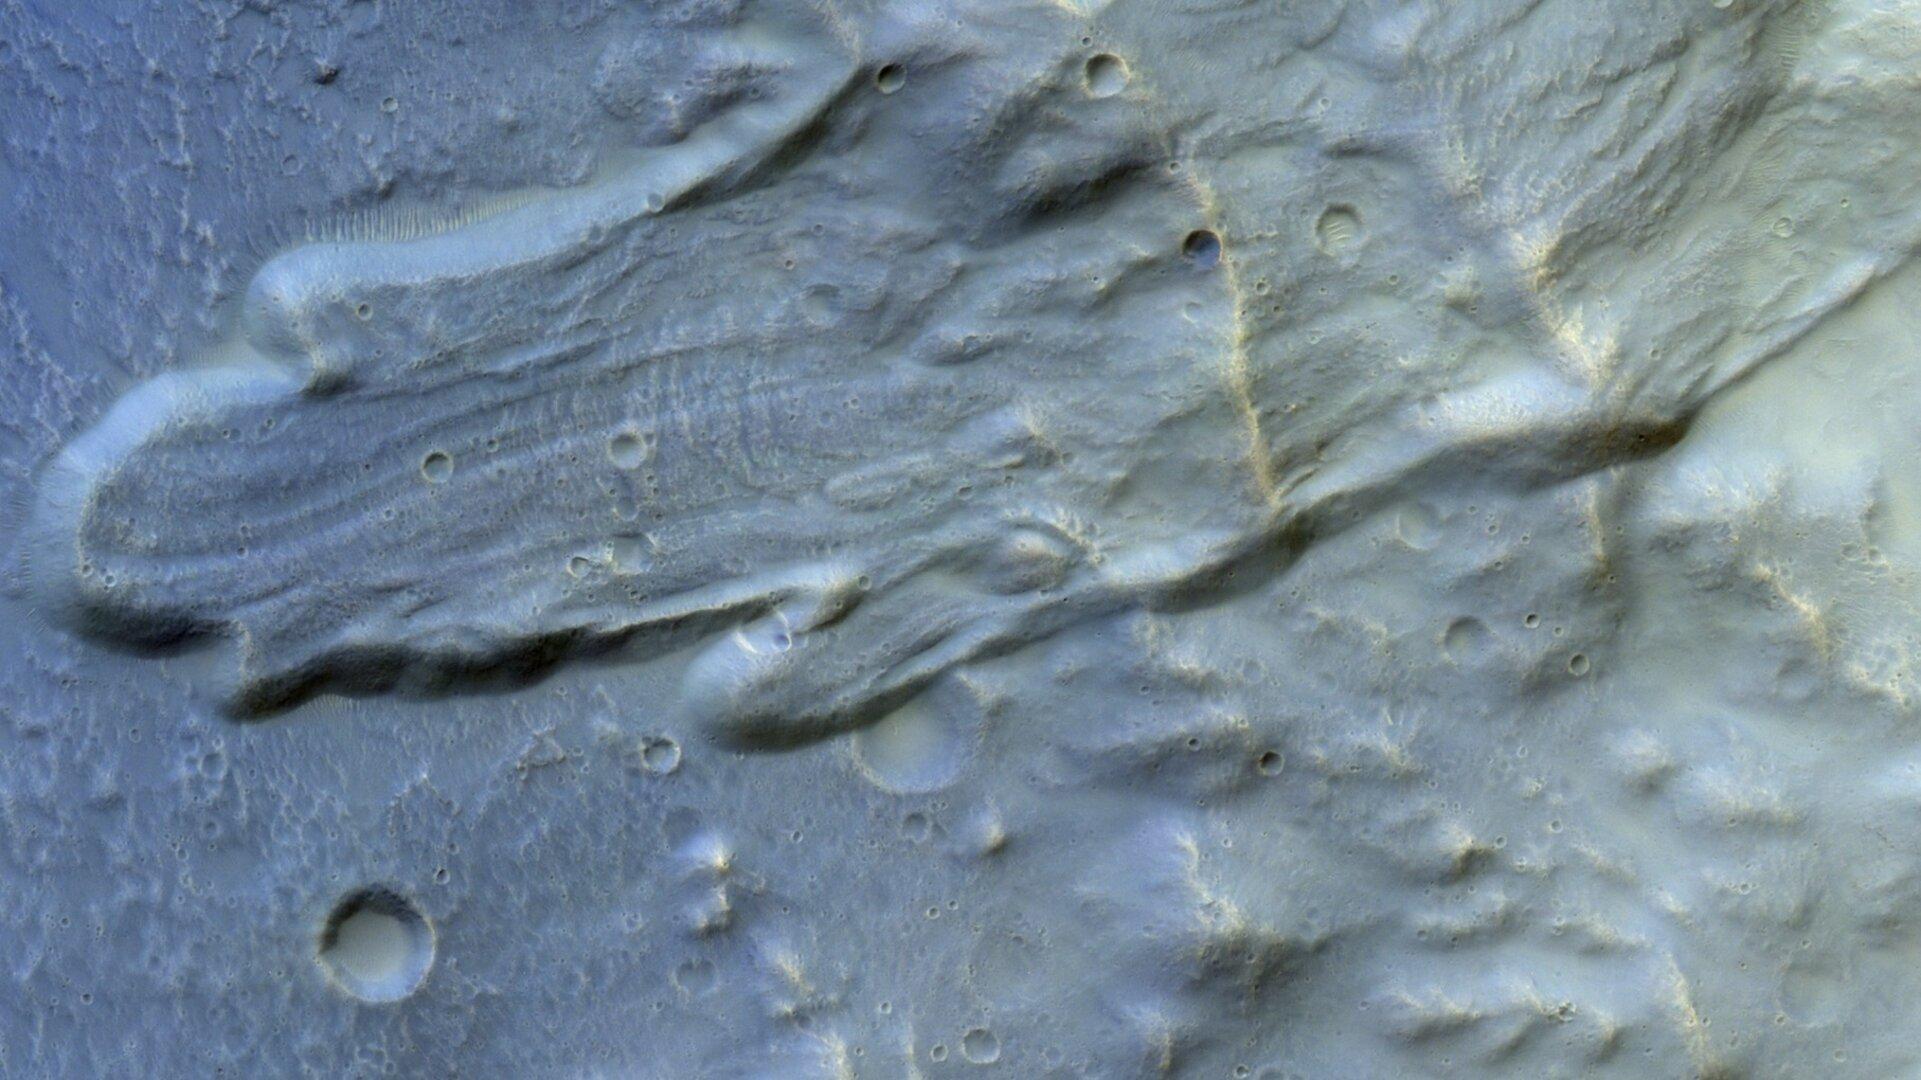 ESA показало редкий снимок марсианского оползня